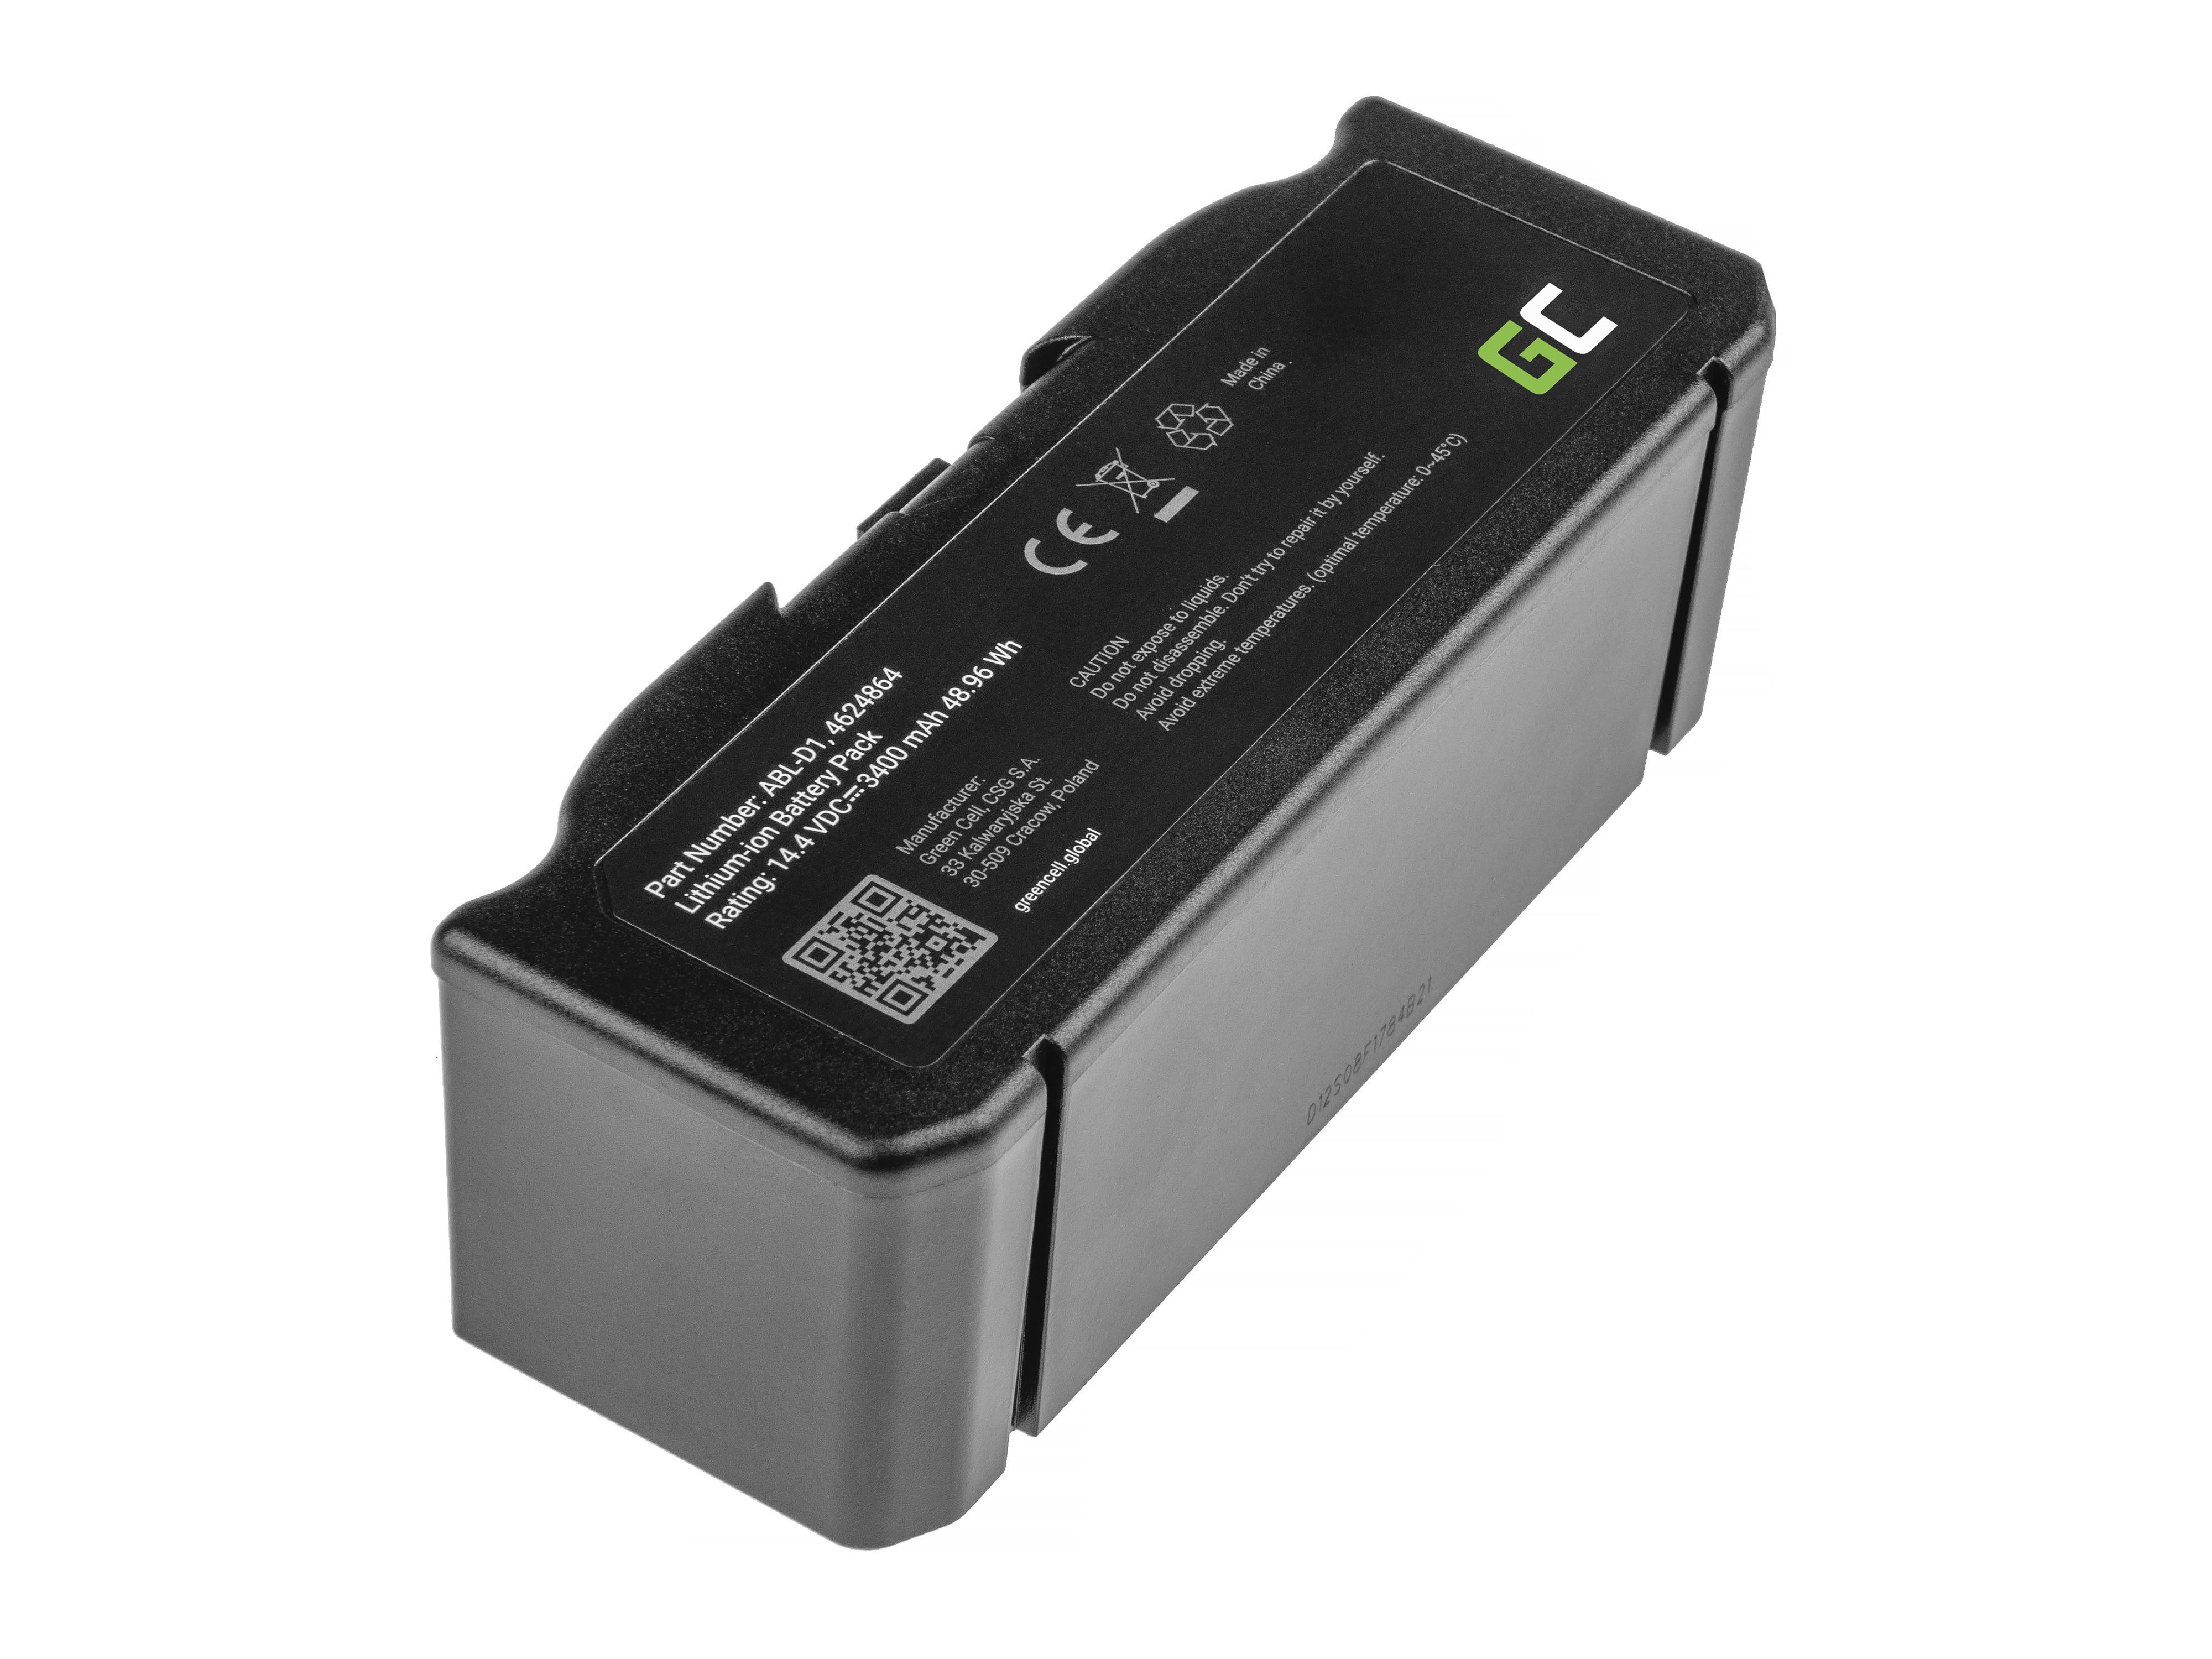 Green Cell PT259 Baterie iRobot ABL-D1, 4624864, iRobot Roomba e5, e6, i3, i3+, i7, i7+, i8, i8+ 14.4V 3400mAh Li-ion - neoriginální